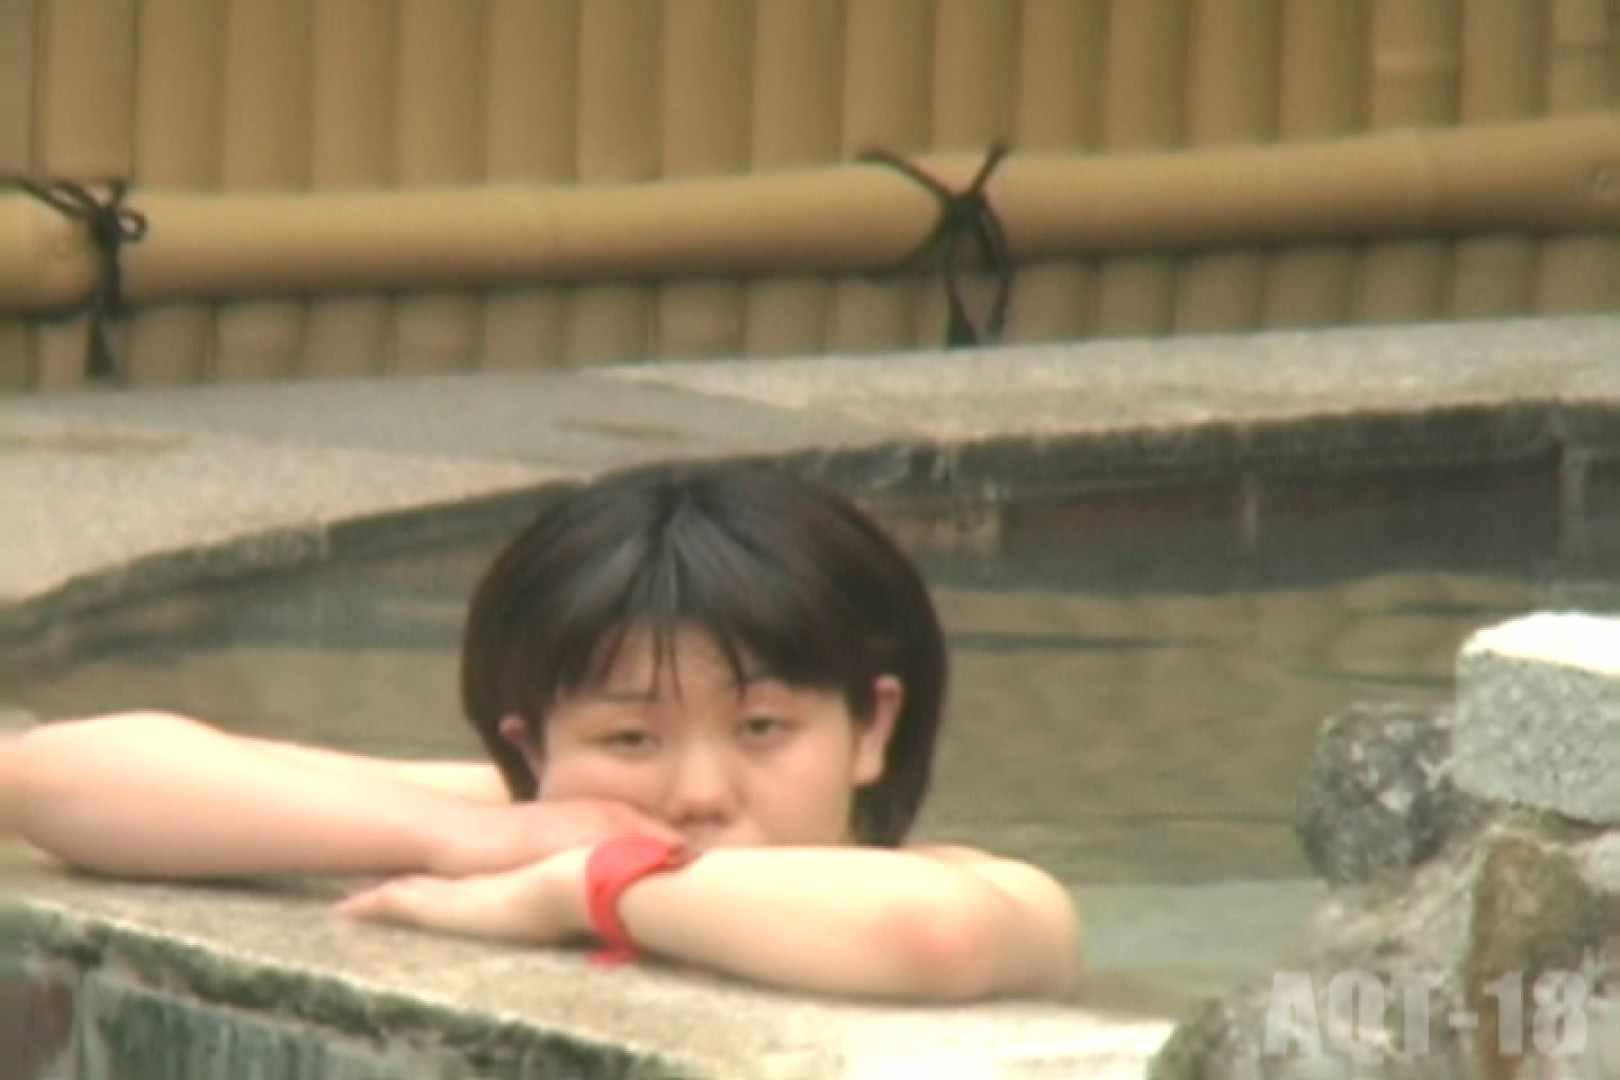 Aquaな露天風呂Vol.861 盗撮特撮 オマンコ動画キャプチャ 12pic 11